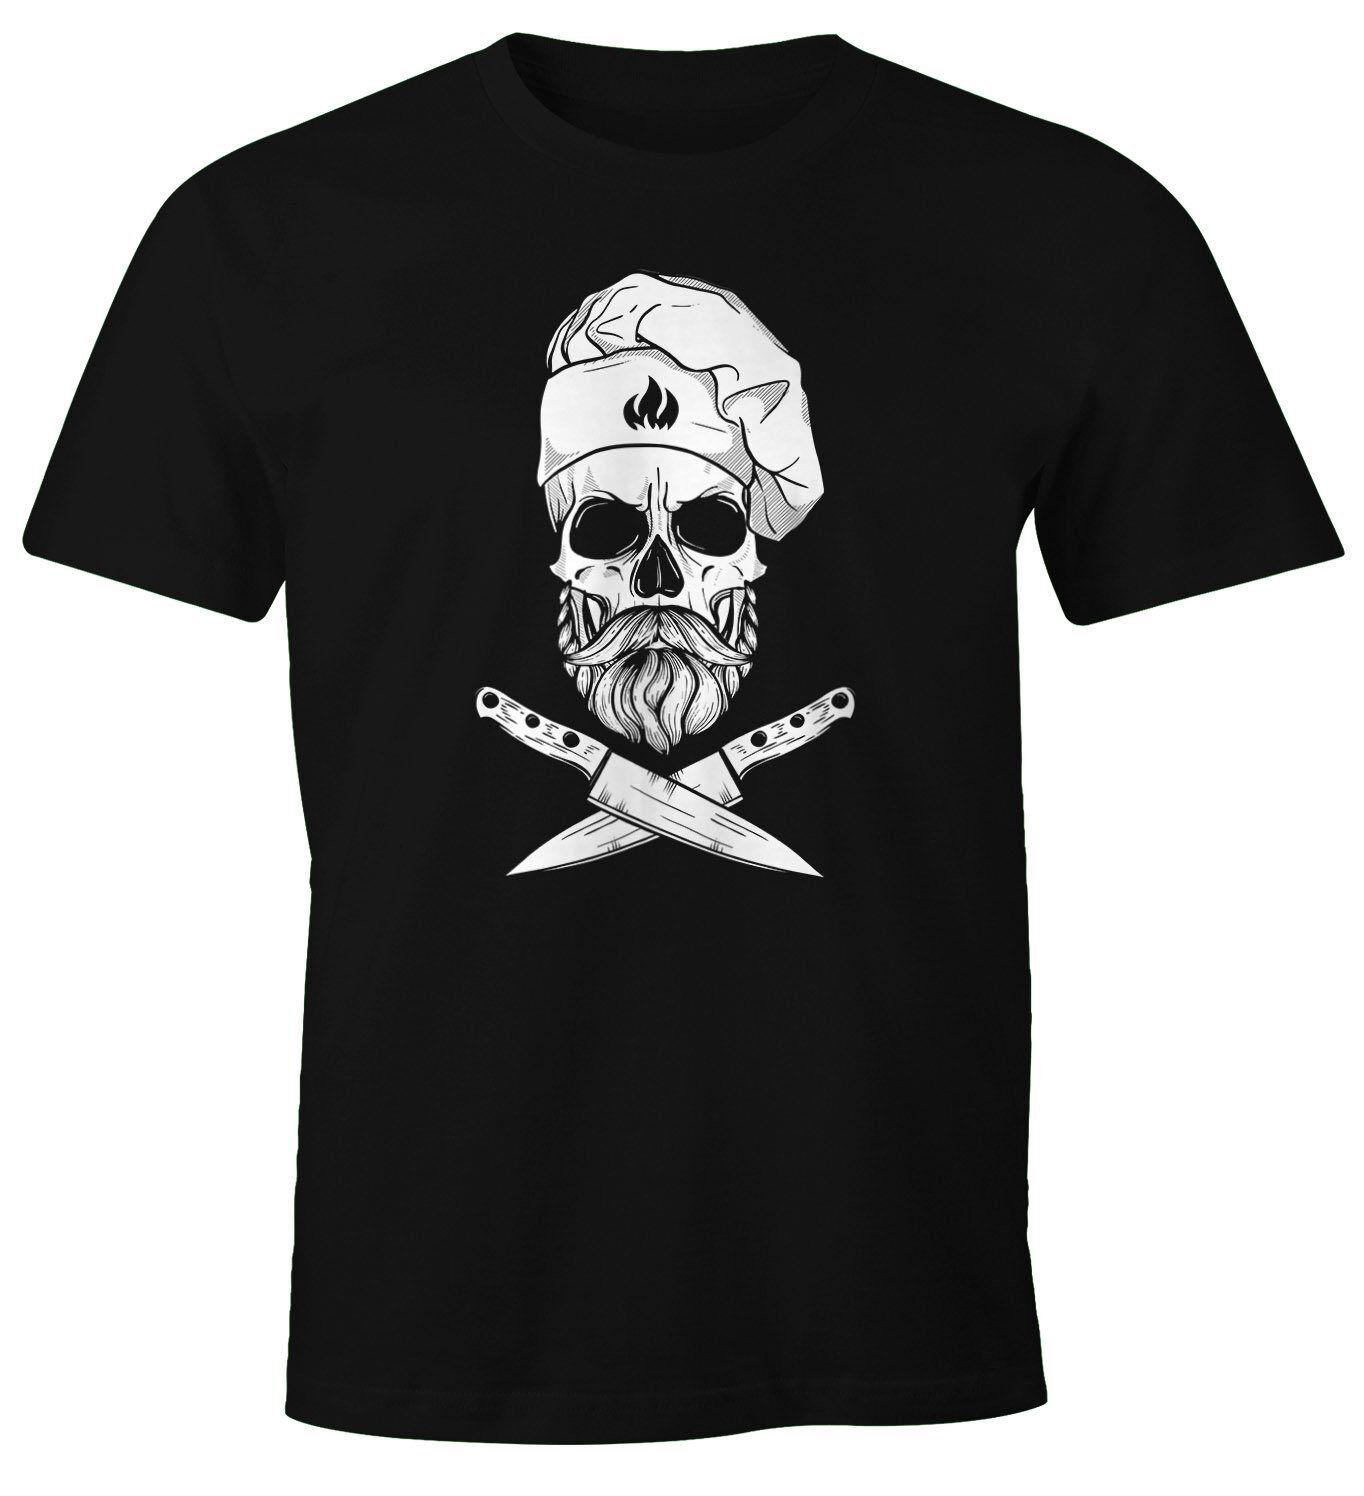 MoonWorks Print-Shirt »Herren T-Shirt Grillen Koch Totenkopf Messer Hipster Skull Chef Grill-Shirt ®« mit Print, schwarz